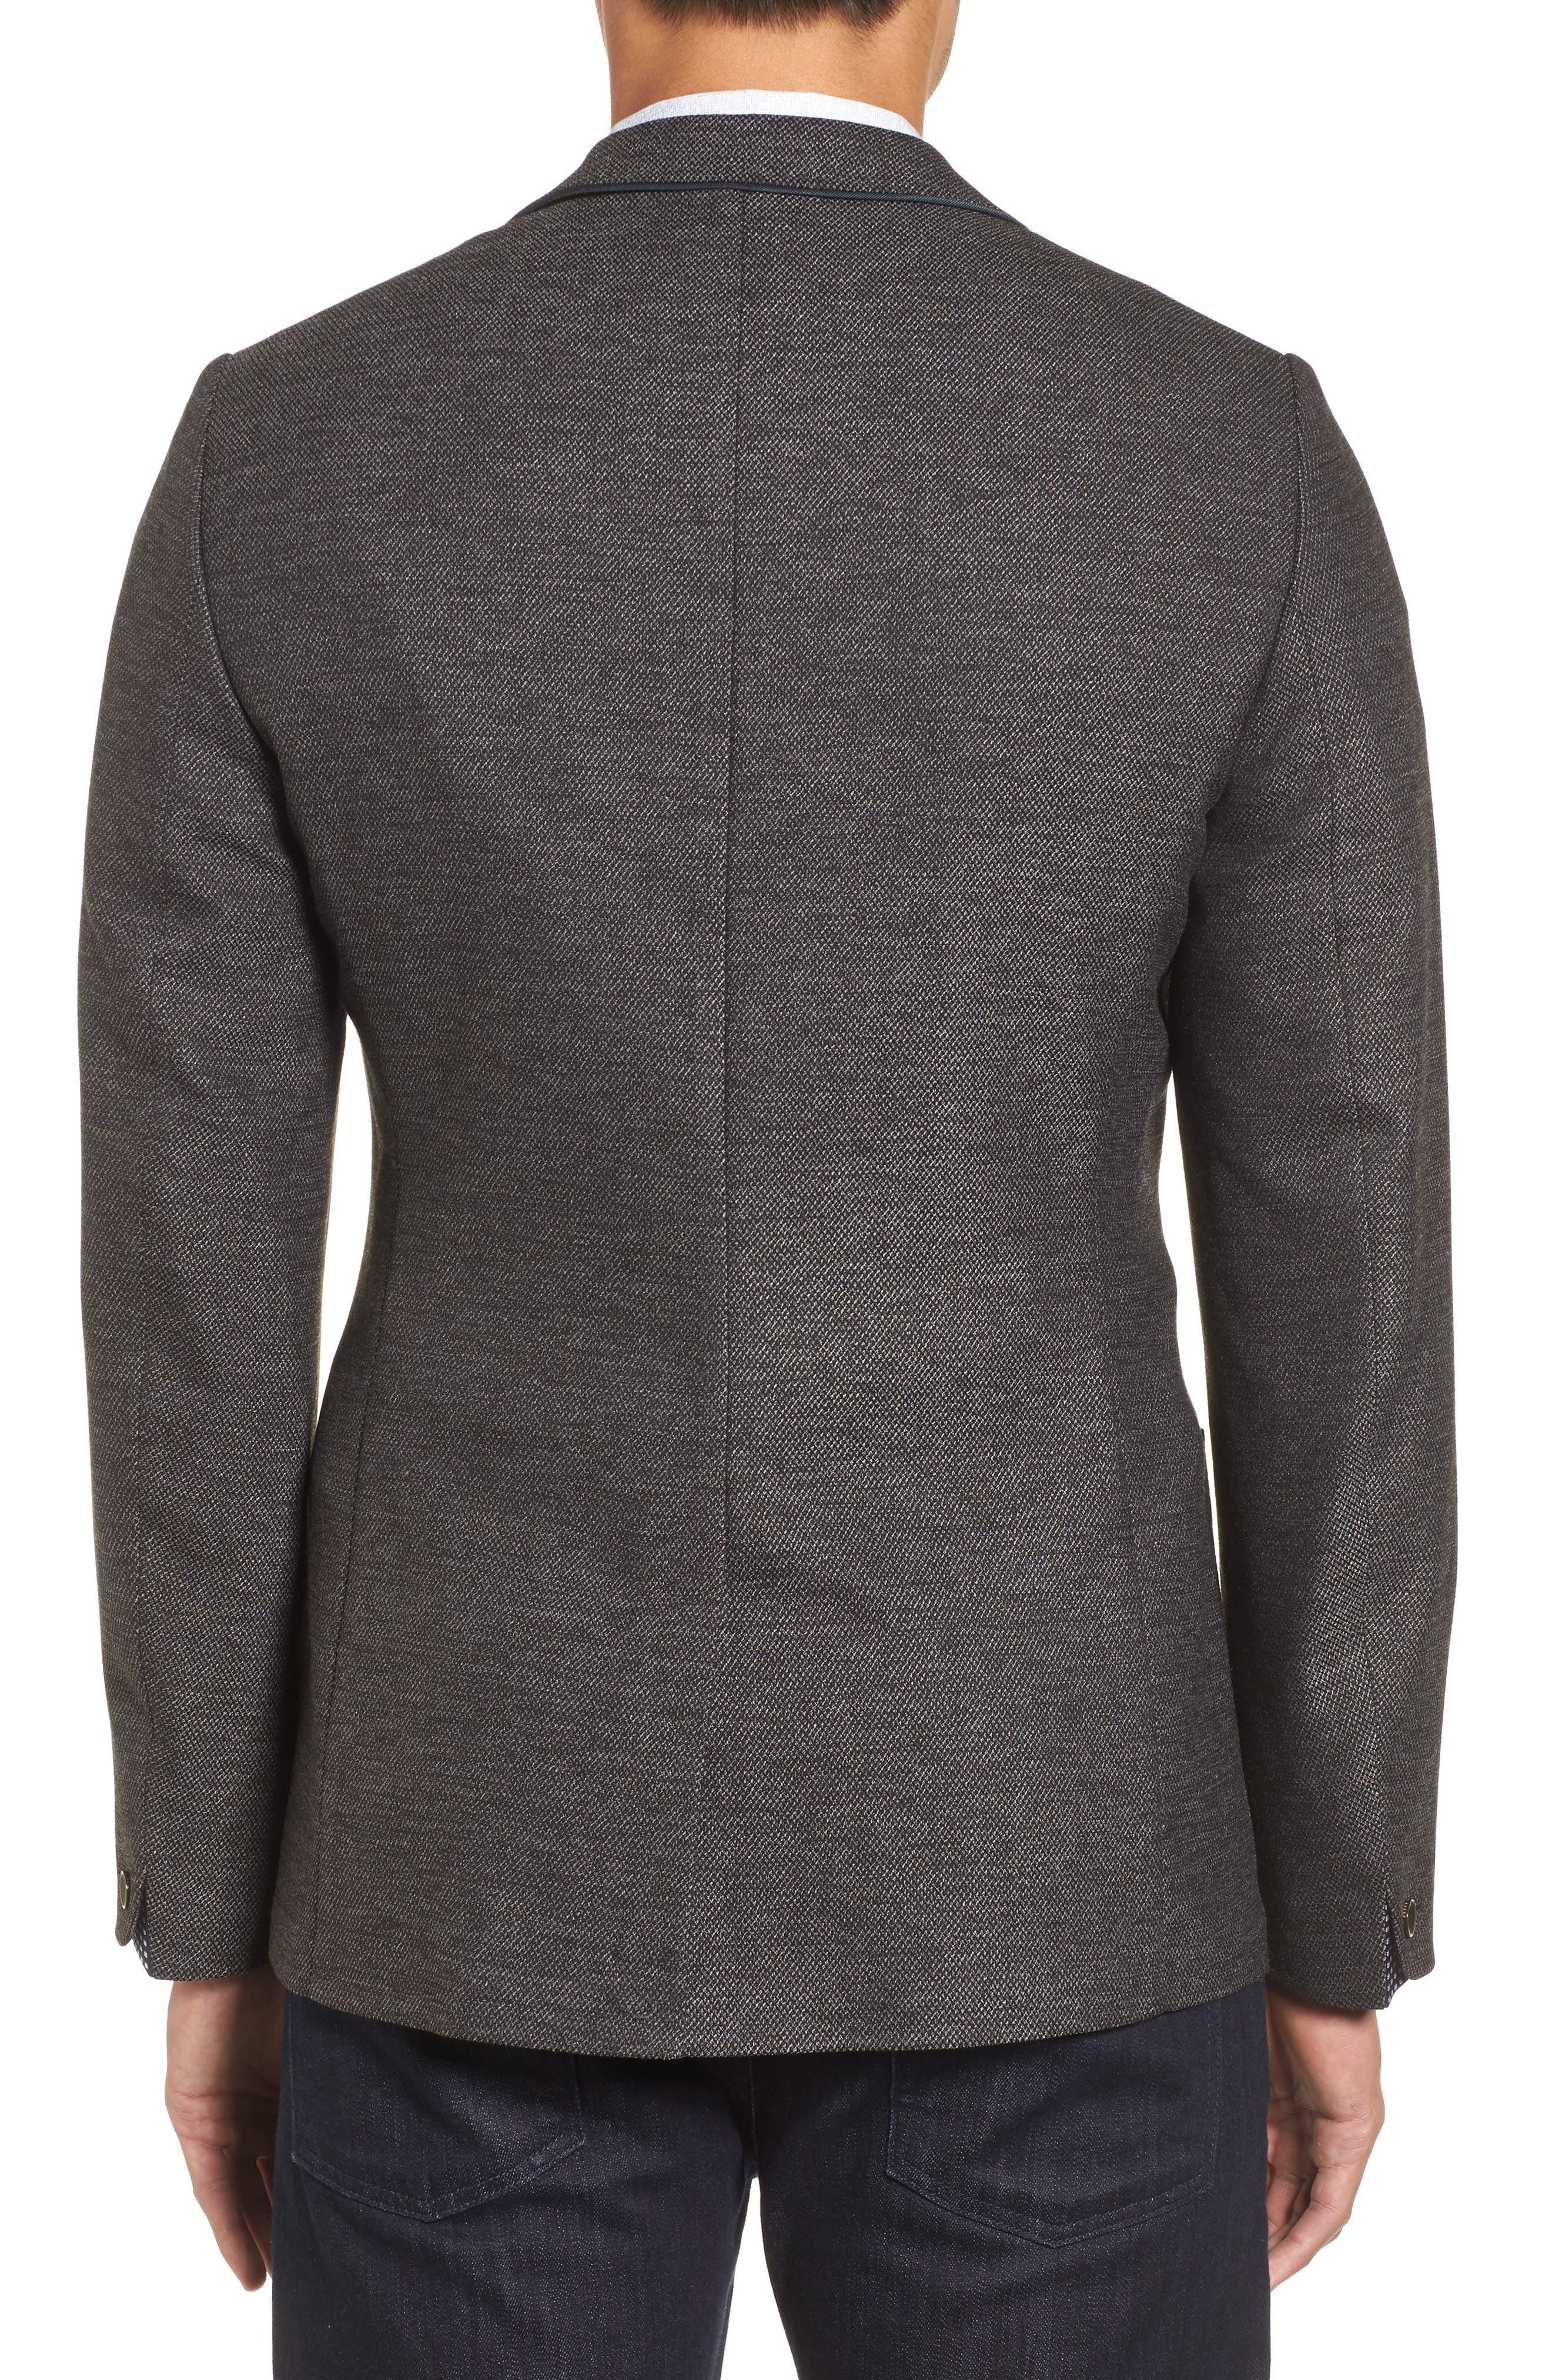 Port Slim Fit Jacket,                             Alternate thumbnail 2, color,                             Charcoal